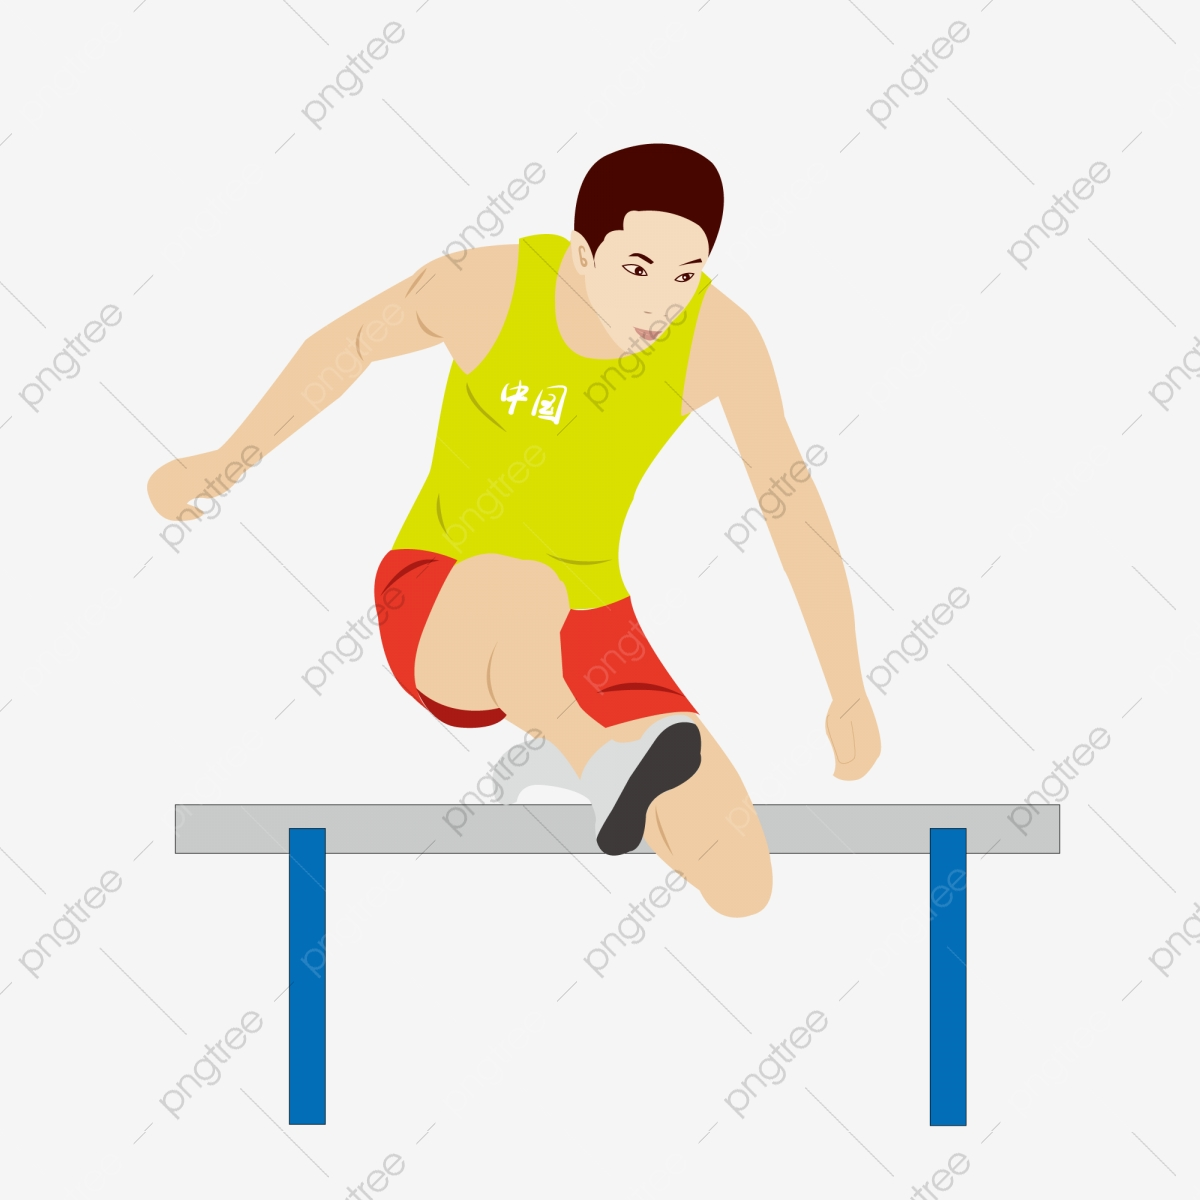 Athlete clipart 100m. Cartoon chinese hurdler free